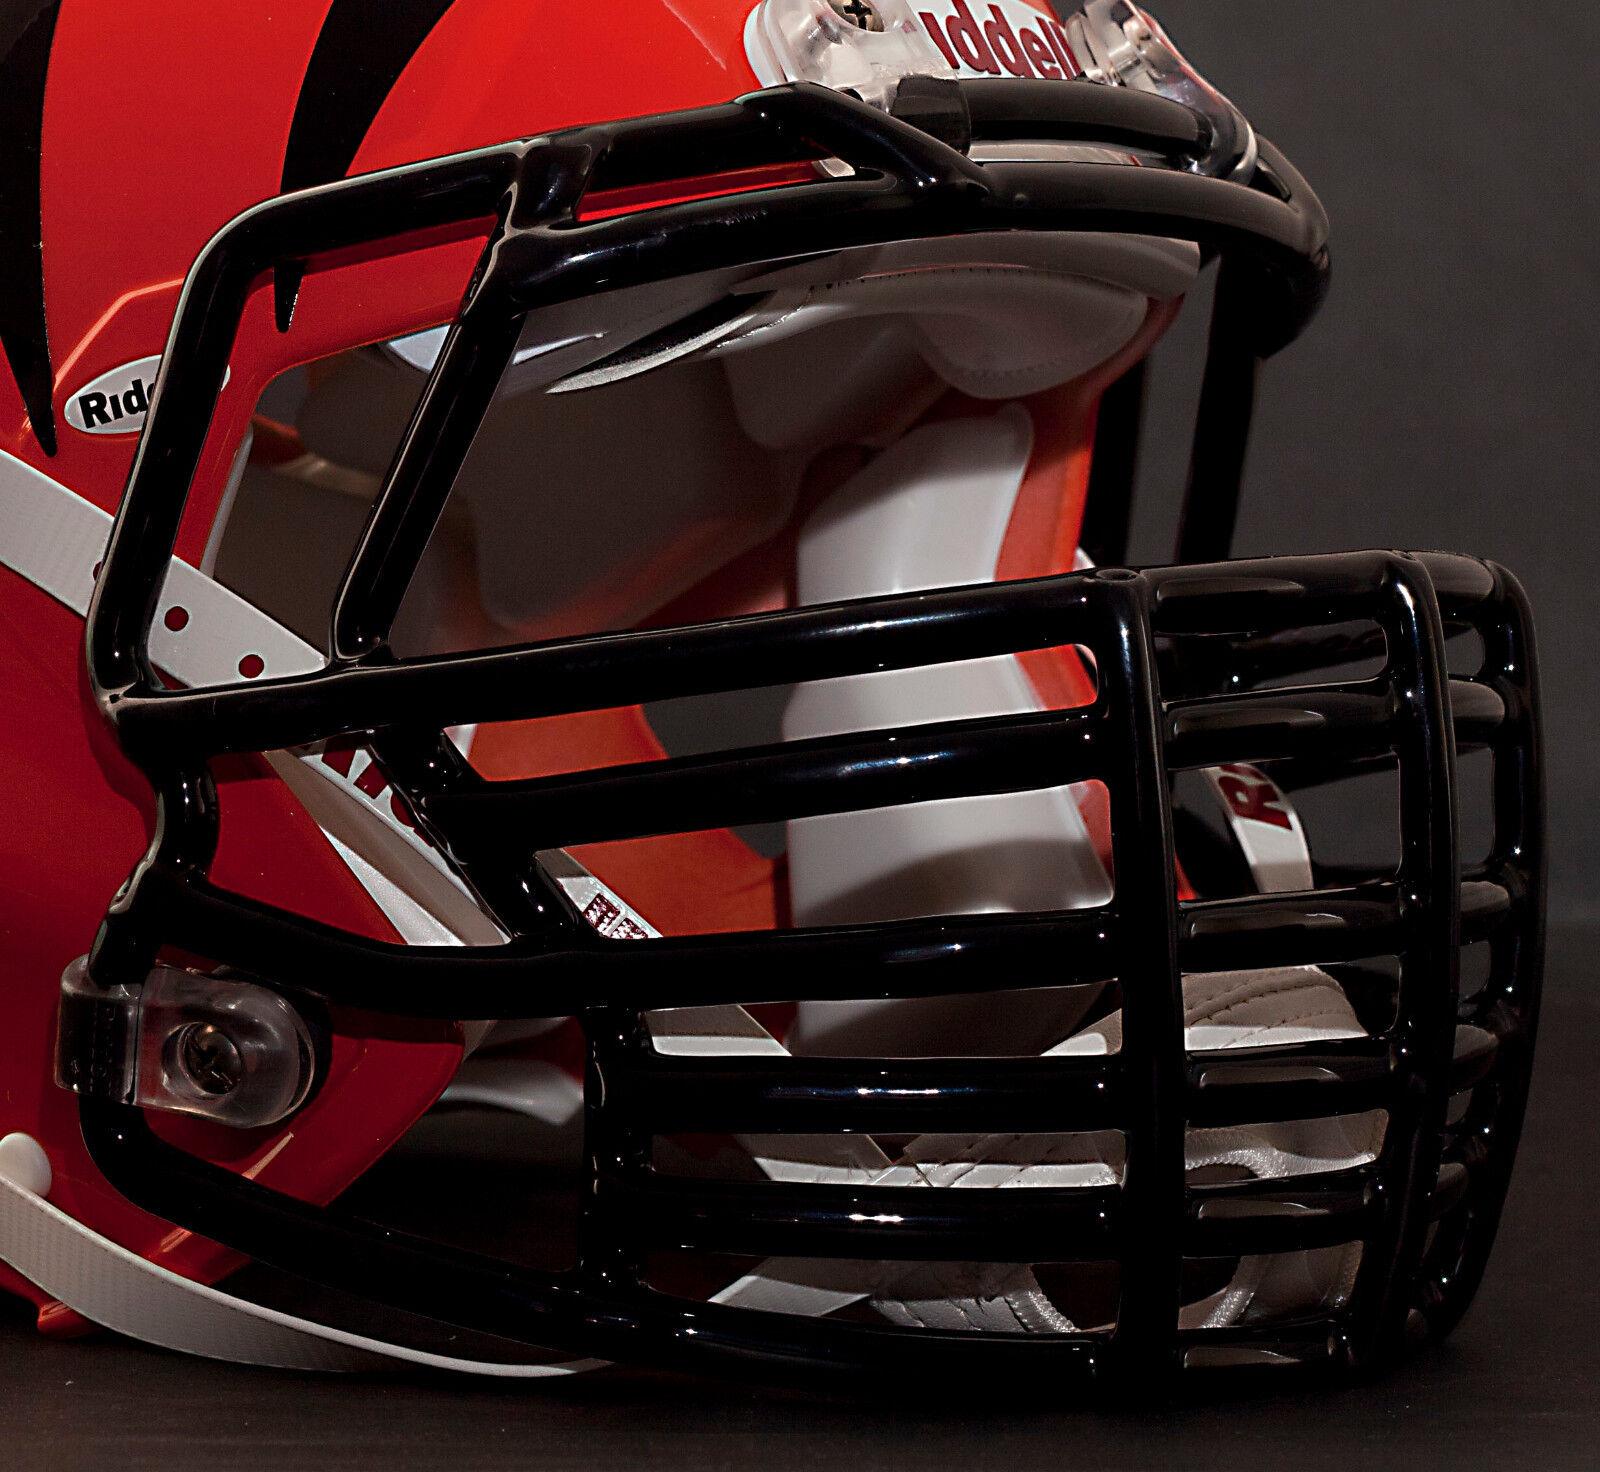 CINCINNATI BENGALS Riddell Speed BIG GRILL S2BDC-HT-LW Football Helmet Facemask